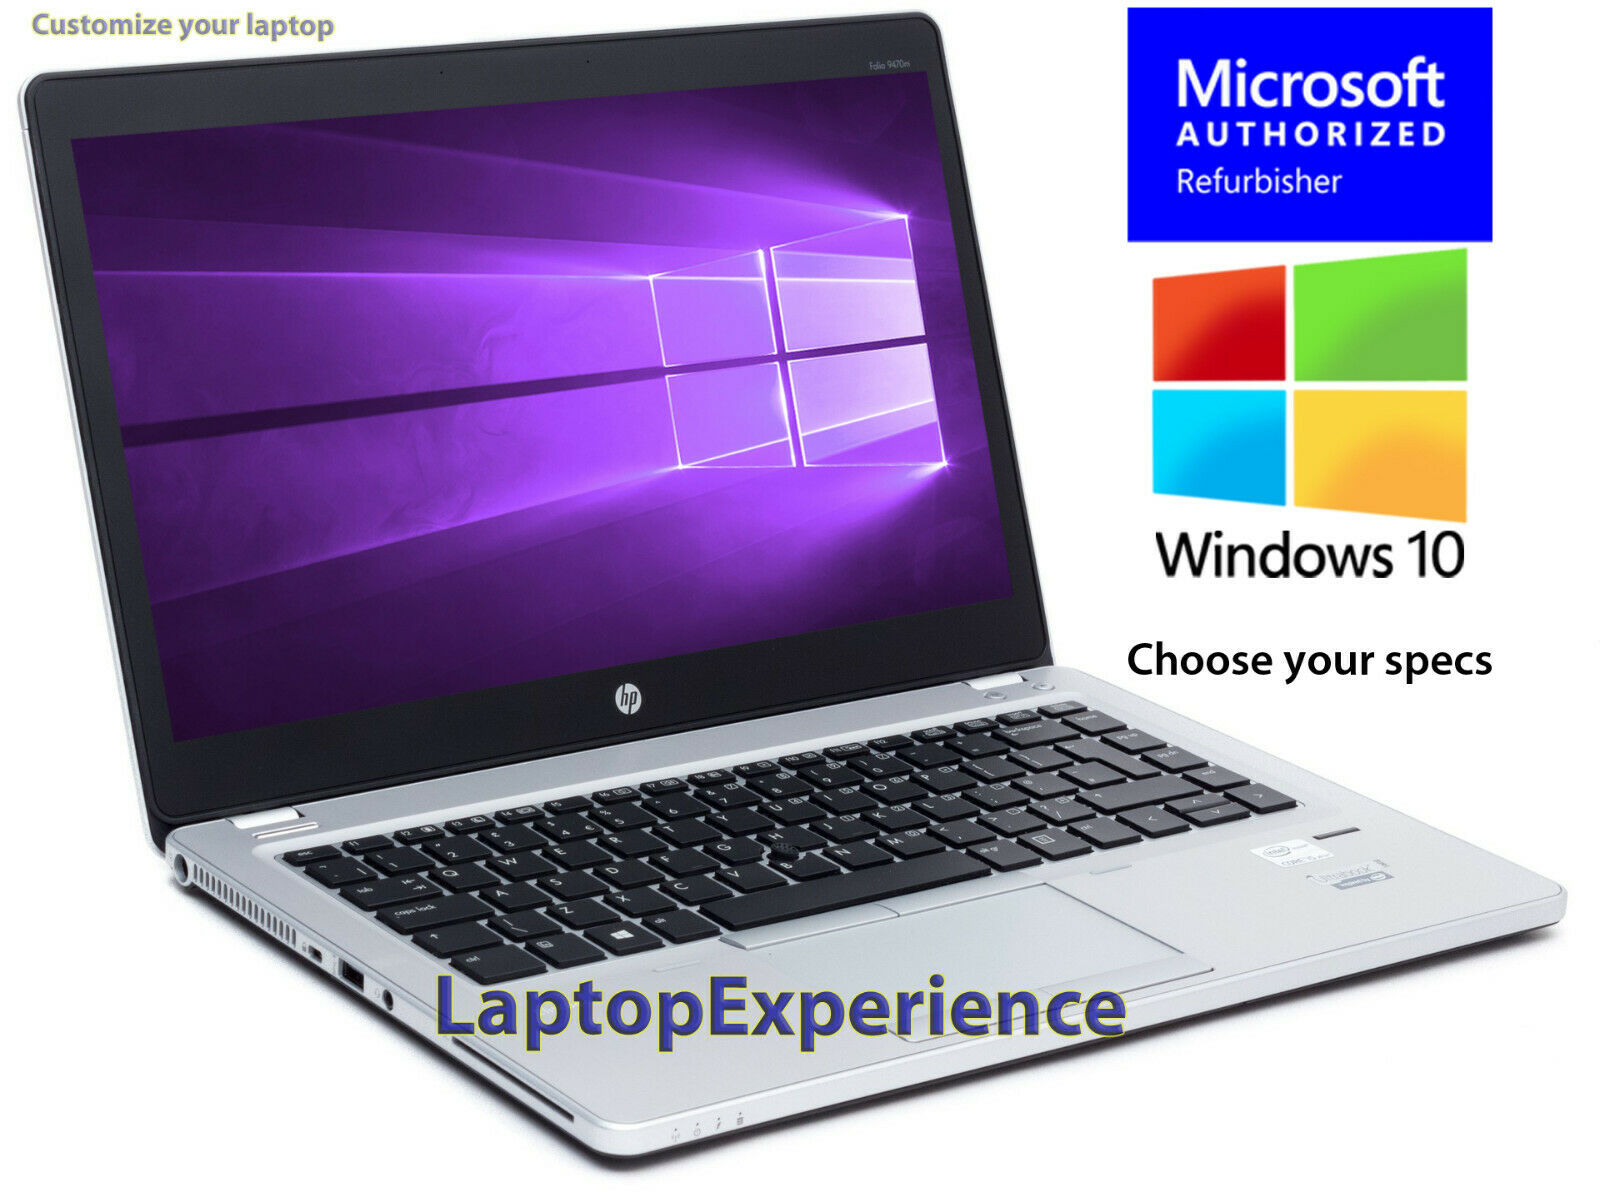 Laptop Windows - HP LAPTOP ELITEBOOK 9470M CORE i7 16GB 480GB SSD HD WINDOWS 10 PRO WiFi NOTEBOOK